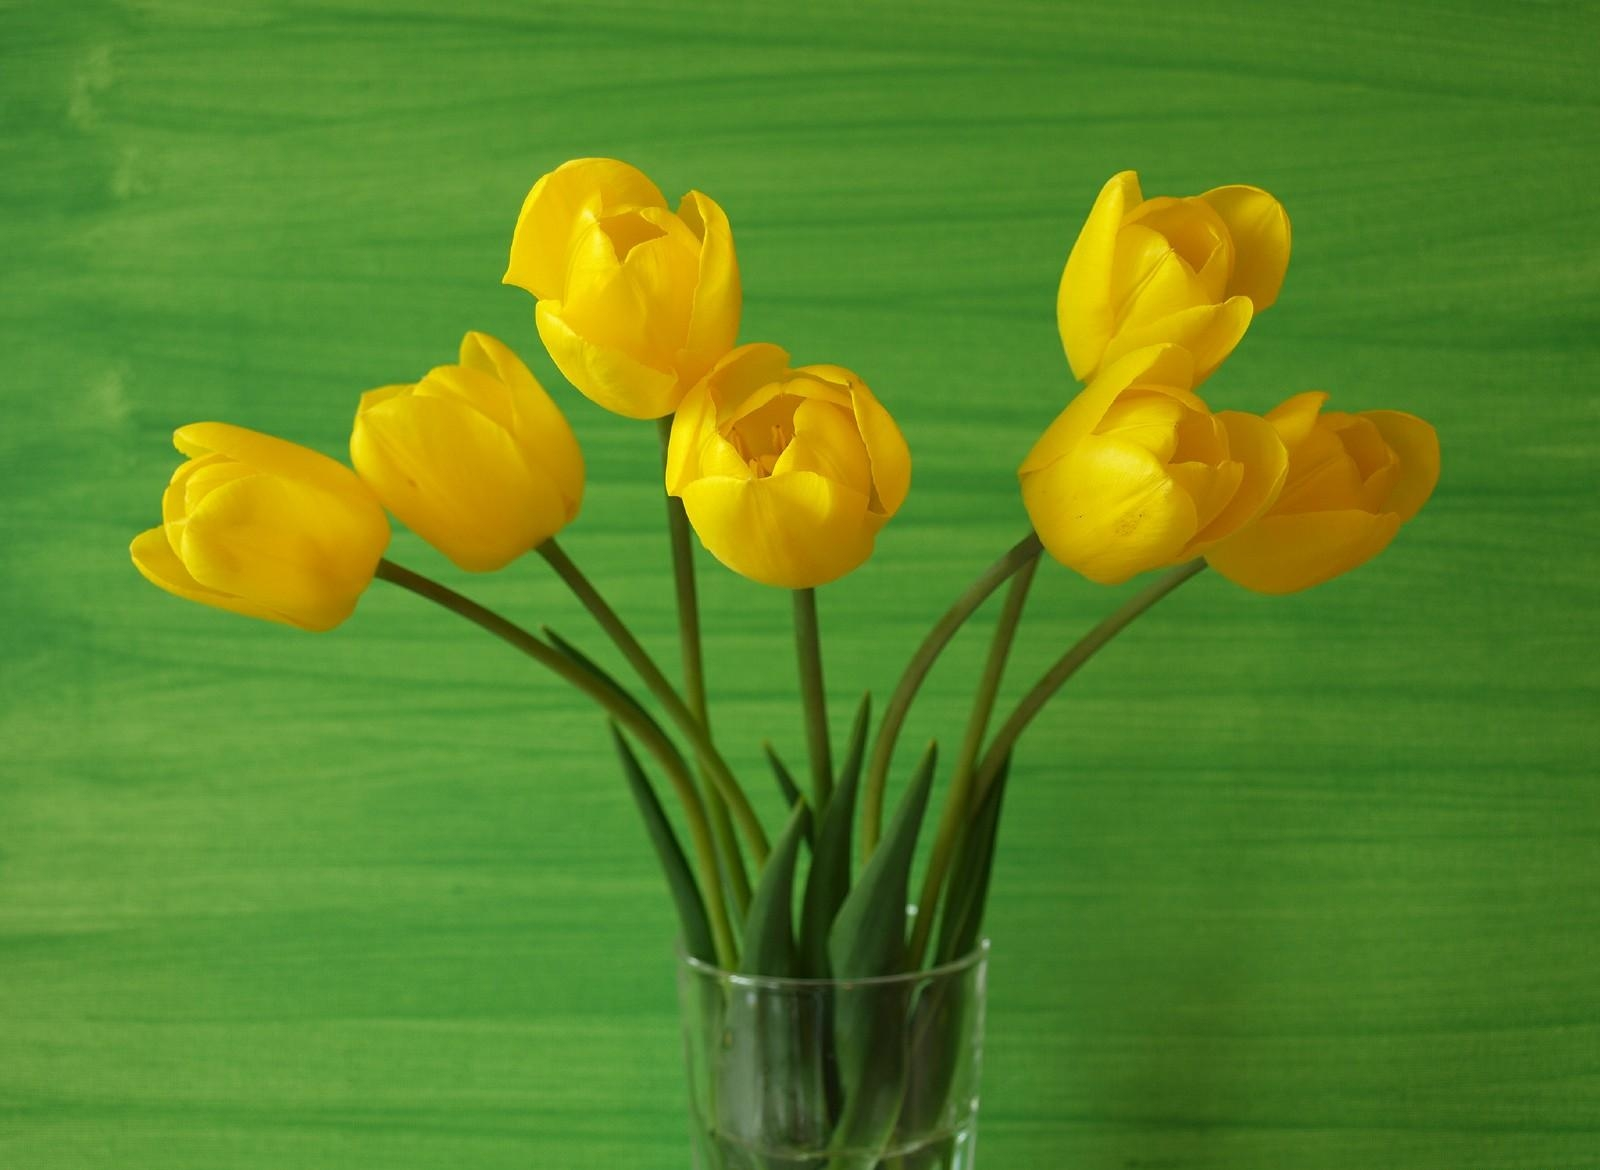 103240 descargar fondo de pantalla Flores, Fondo, Jarrón, Tulipanes: protectores de pantalla e imágenes gratis